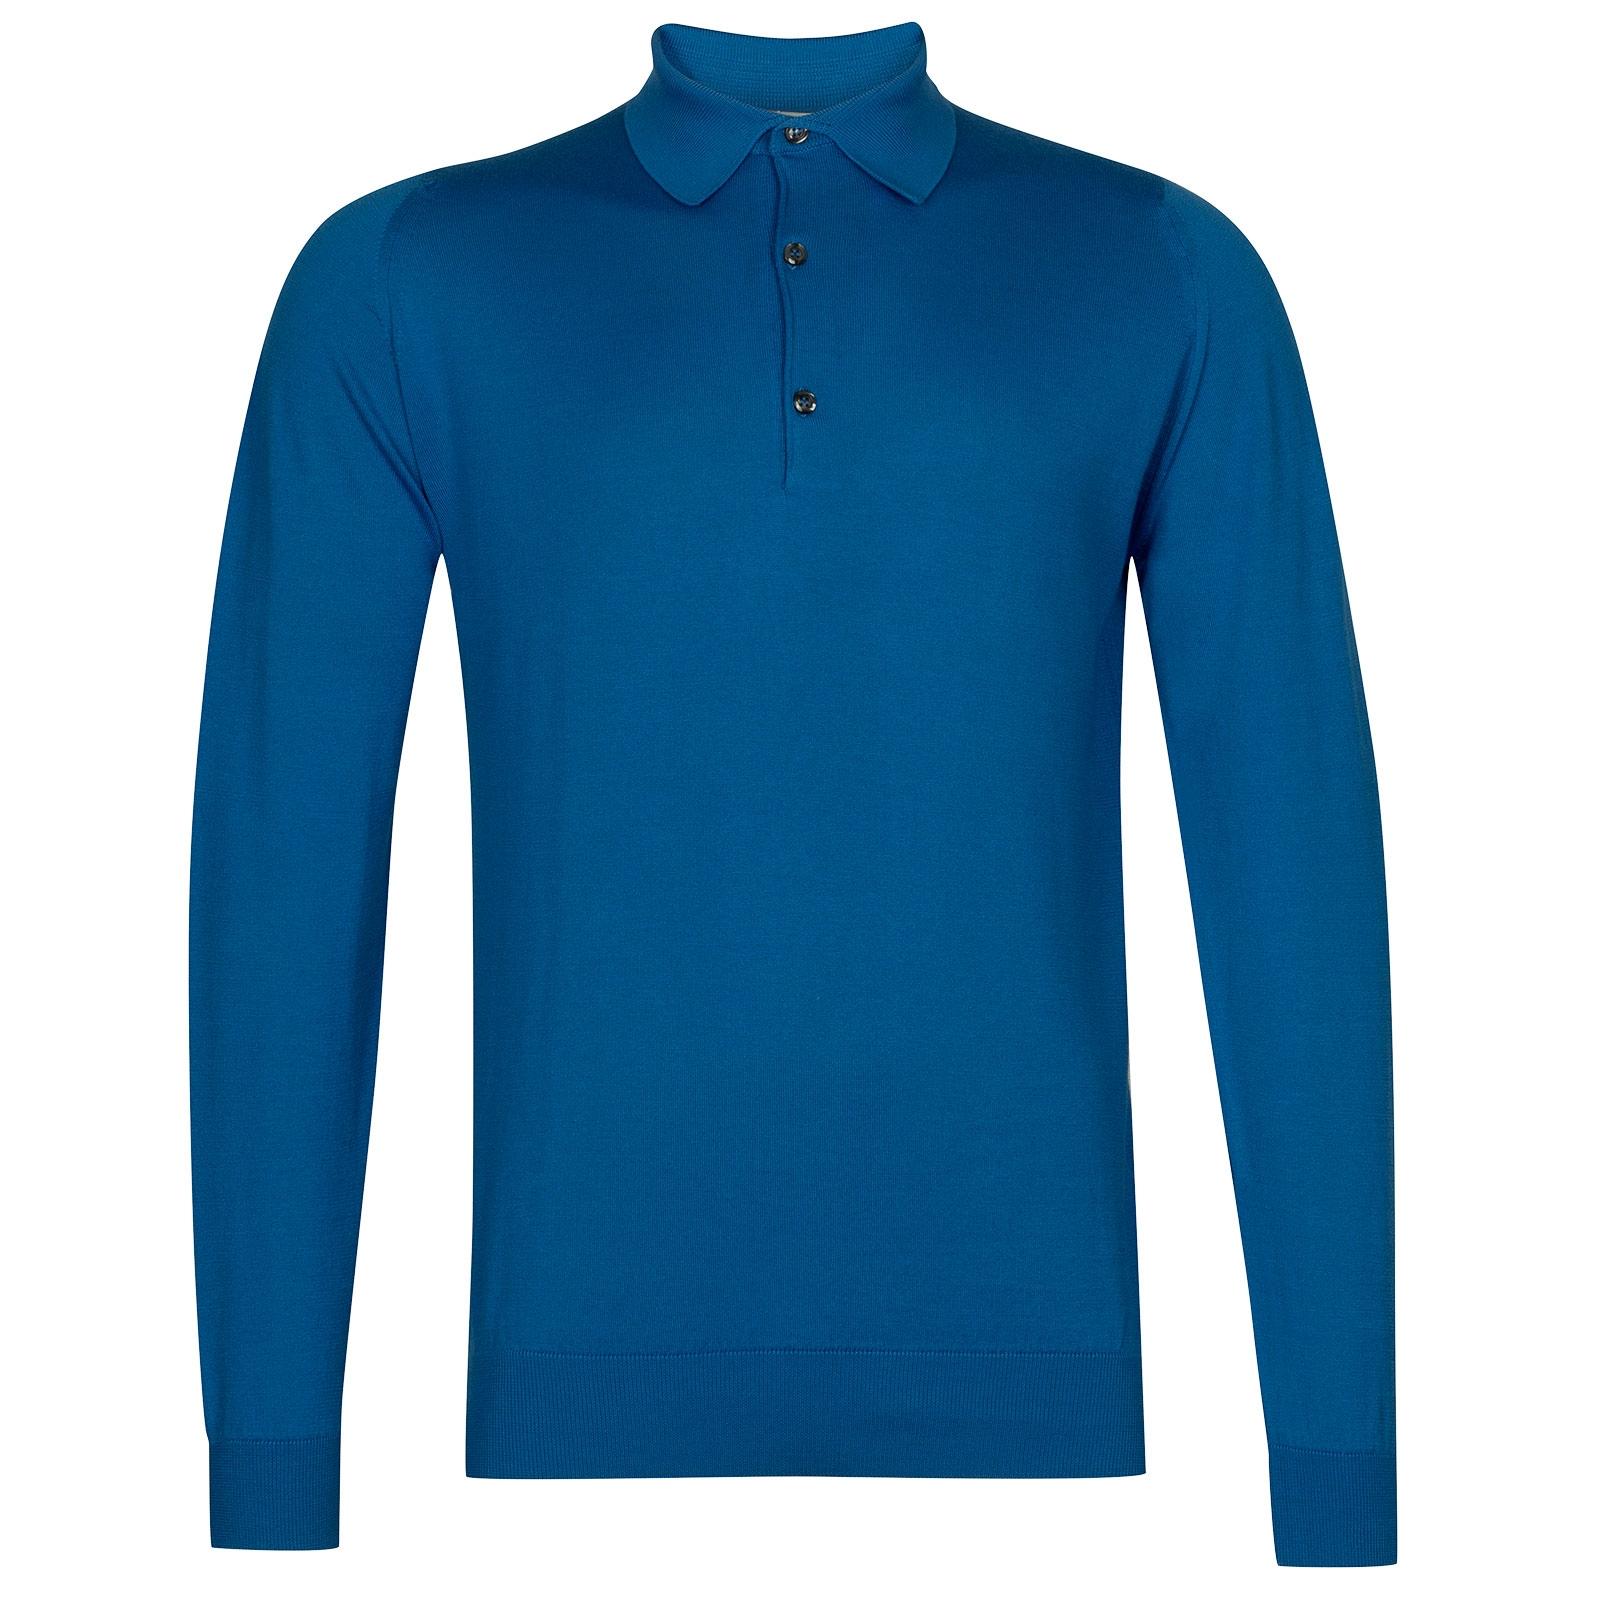 John Smedley Bradwell in Statice Blue Shirt-SML